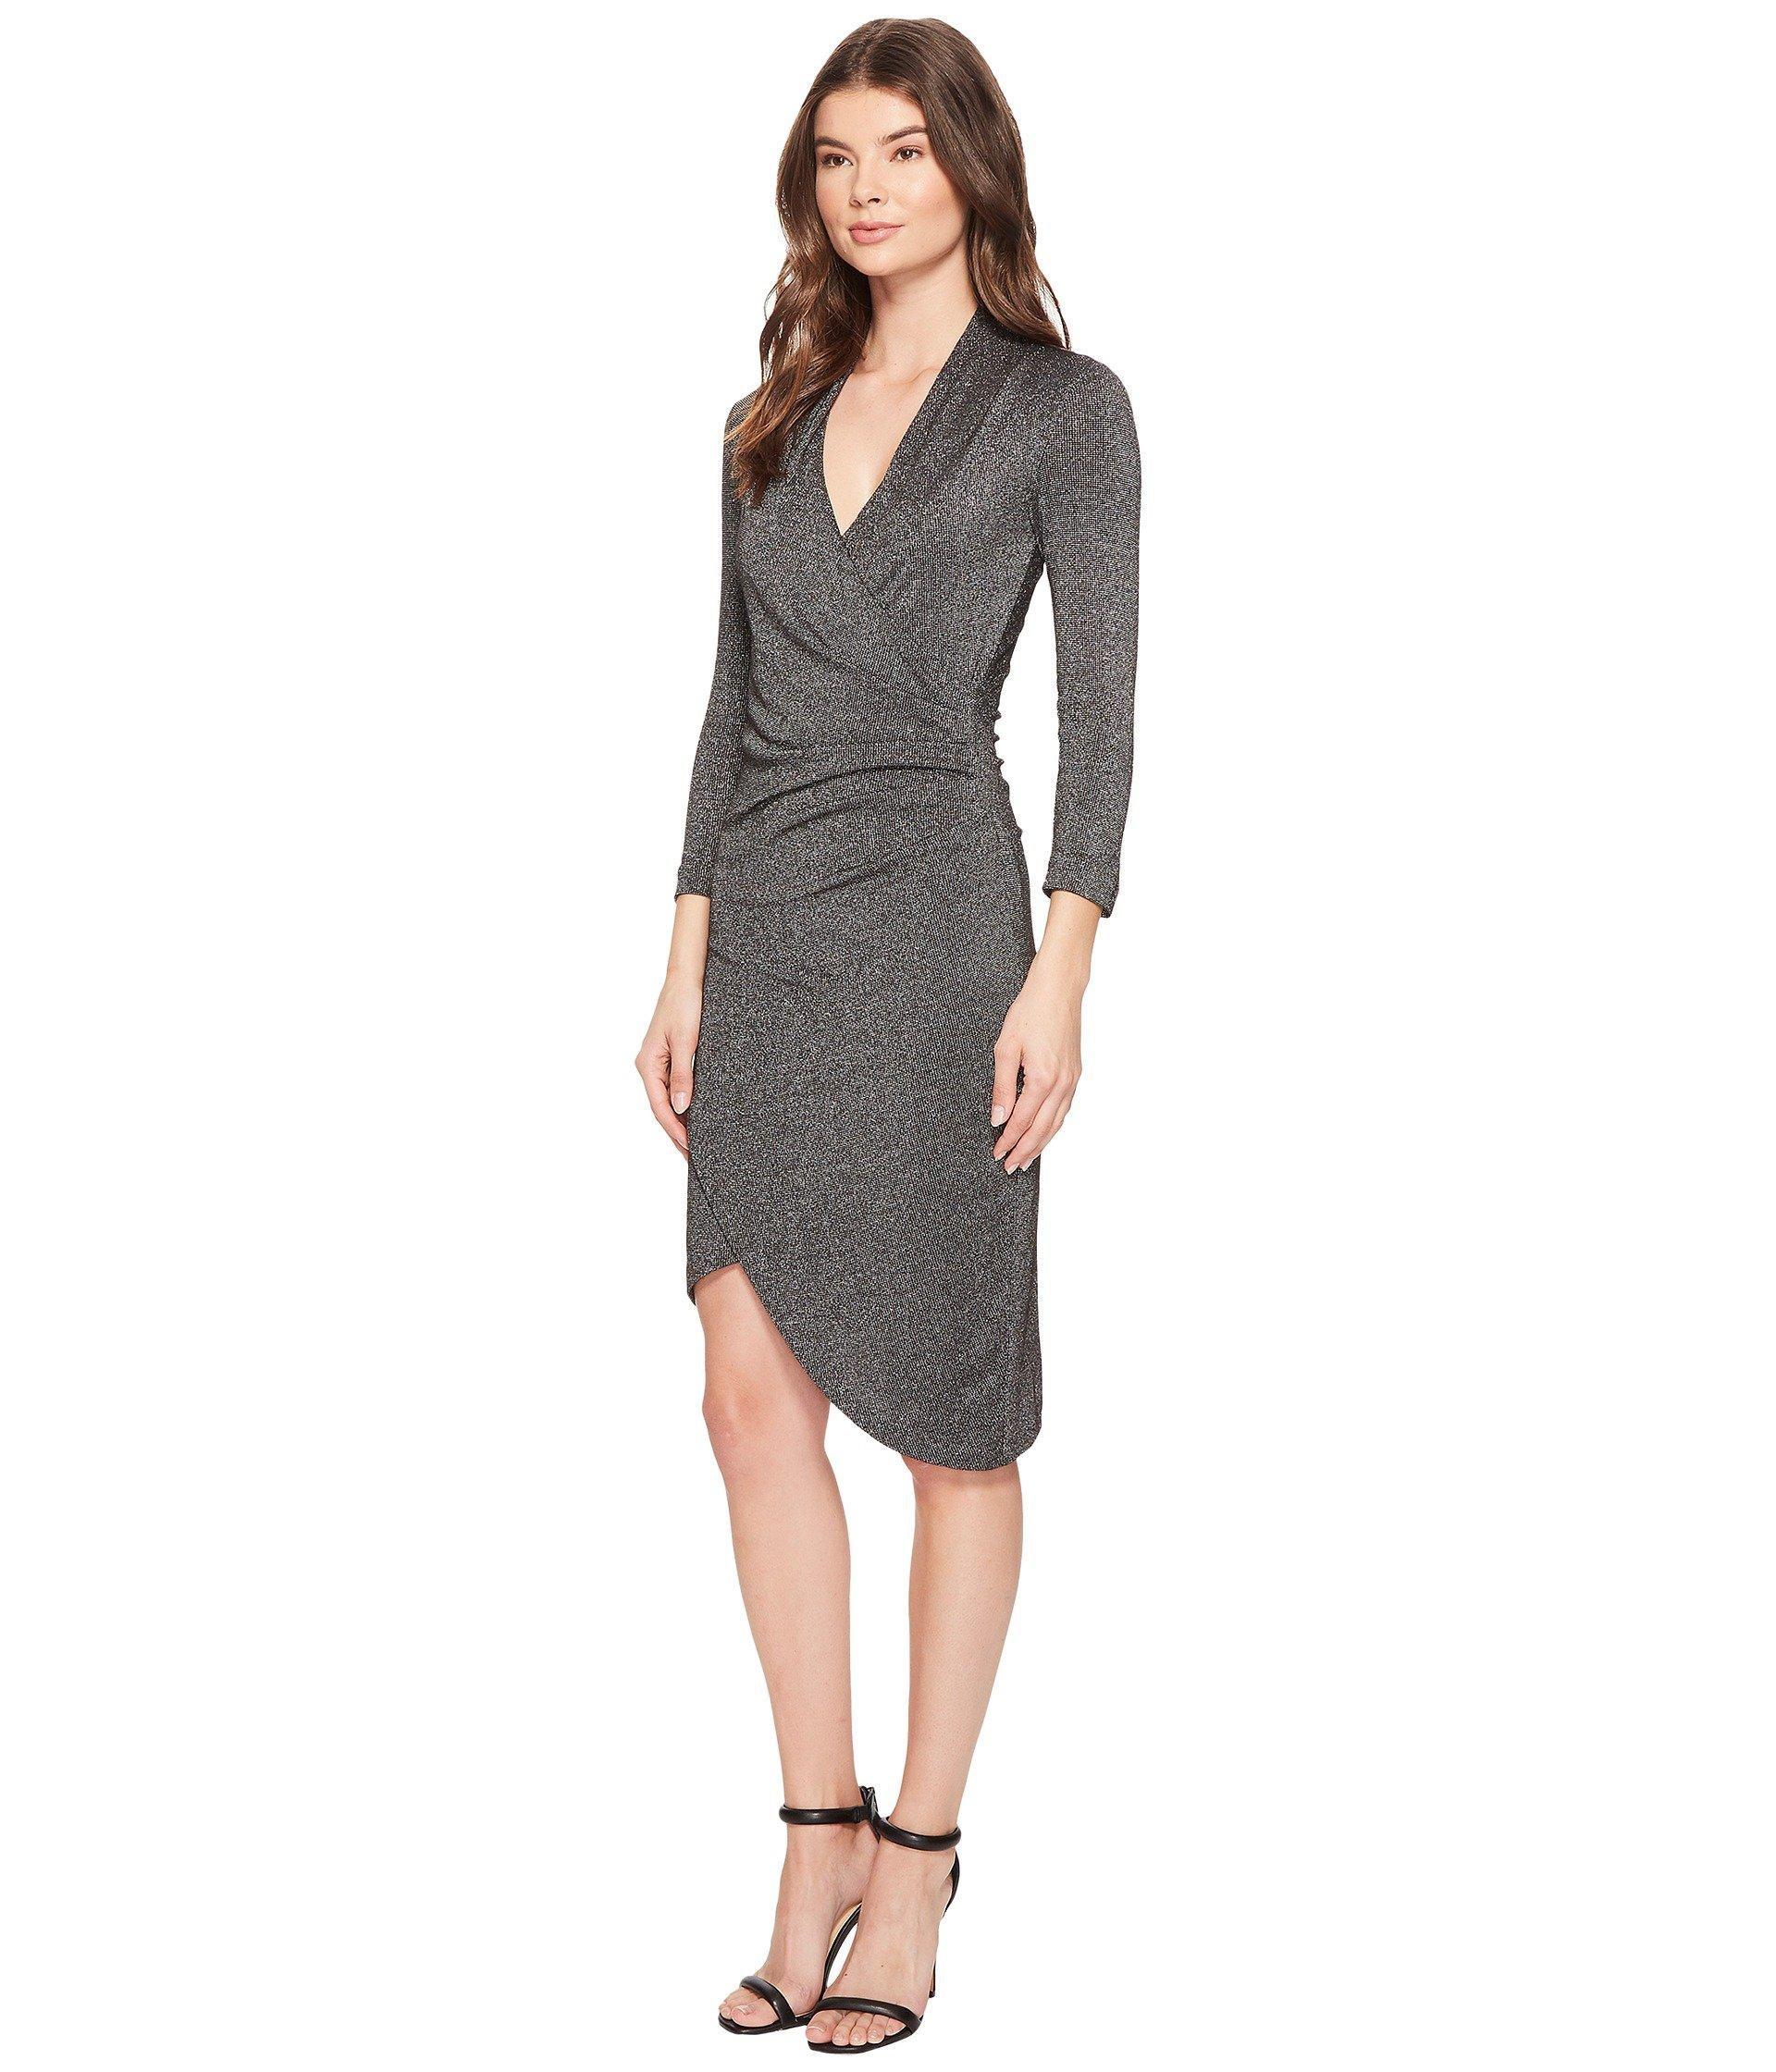 4a8f23675c4 Lyst - Nicole Miller Silver Glitz V-neck Asymmetrical Dress - Save 22%